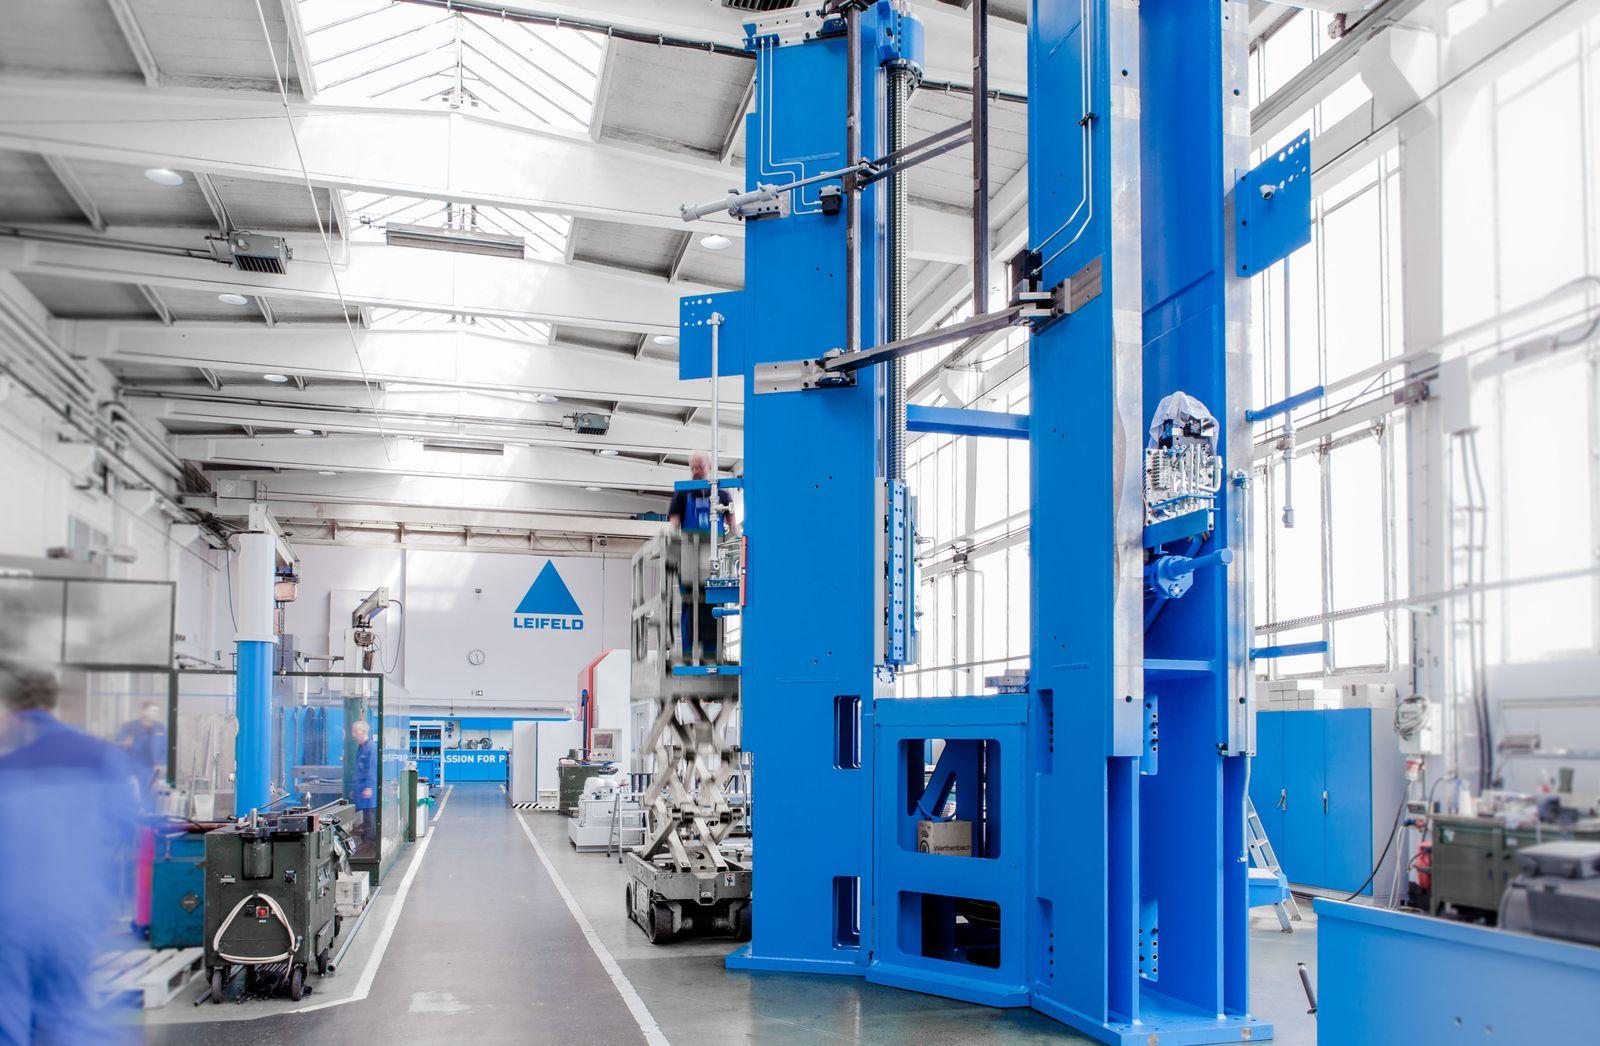 Leifeld Metal Spinning AG